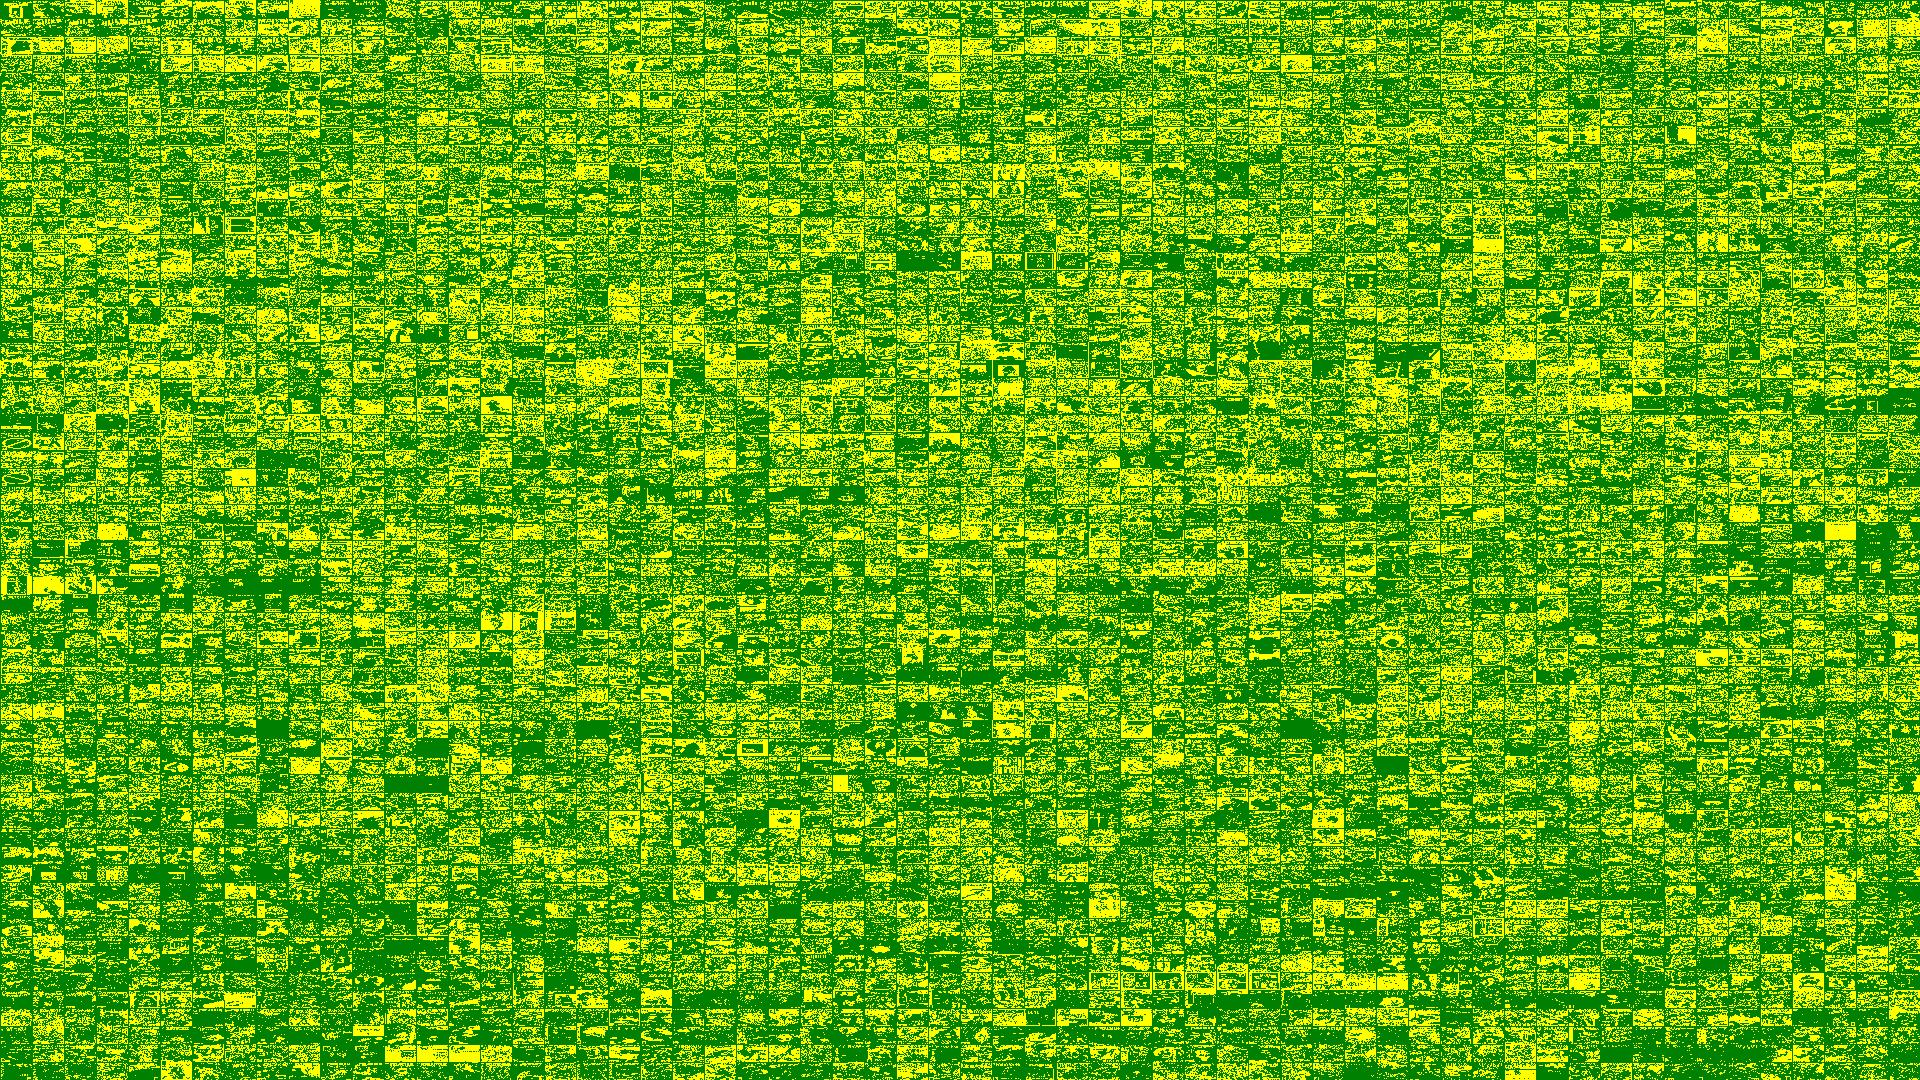 St Patricks Day HD Wallpaper Wide Screen Wallpaper 1080p2K4K 1920x1080